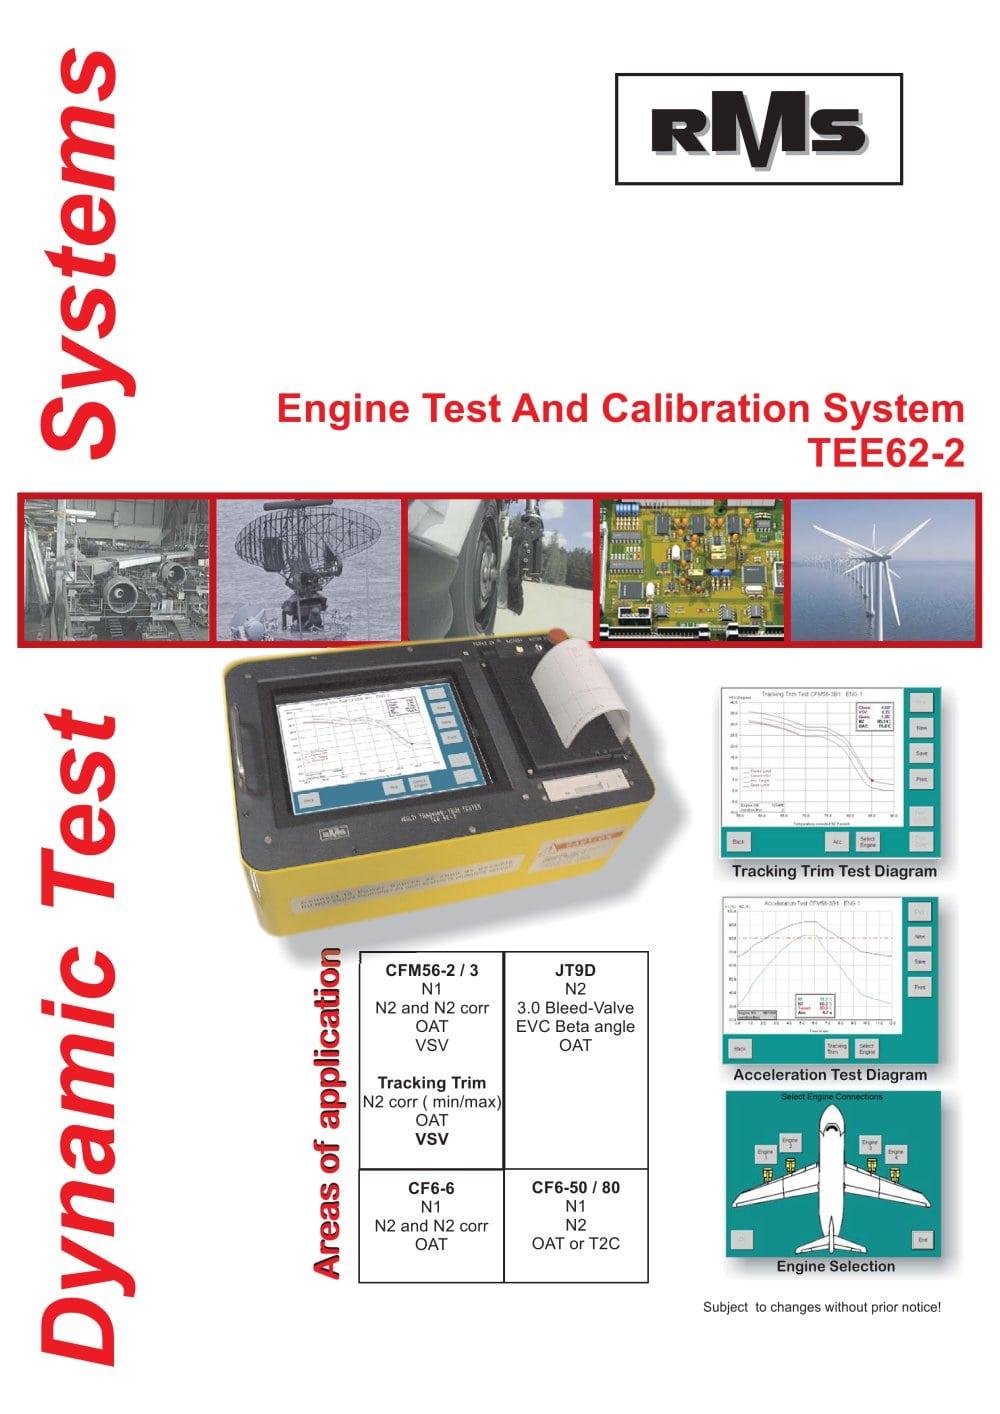 Tee62 2 Rms Pdf Catalogue Technical Documentation Brochure Cfm56 Engine Diagram 1 8 Pages